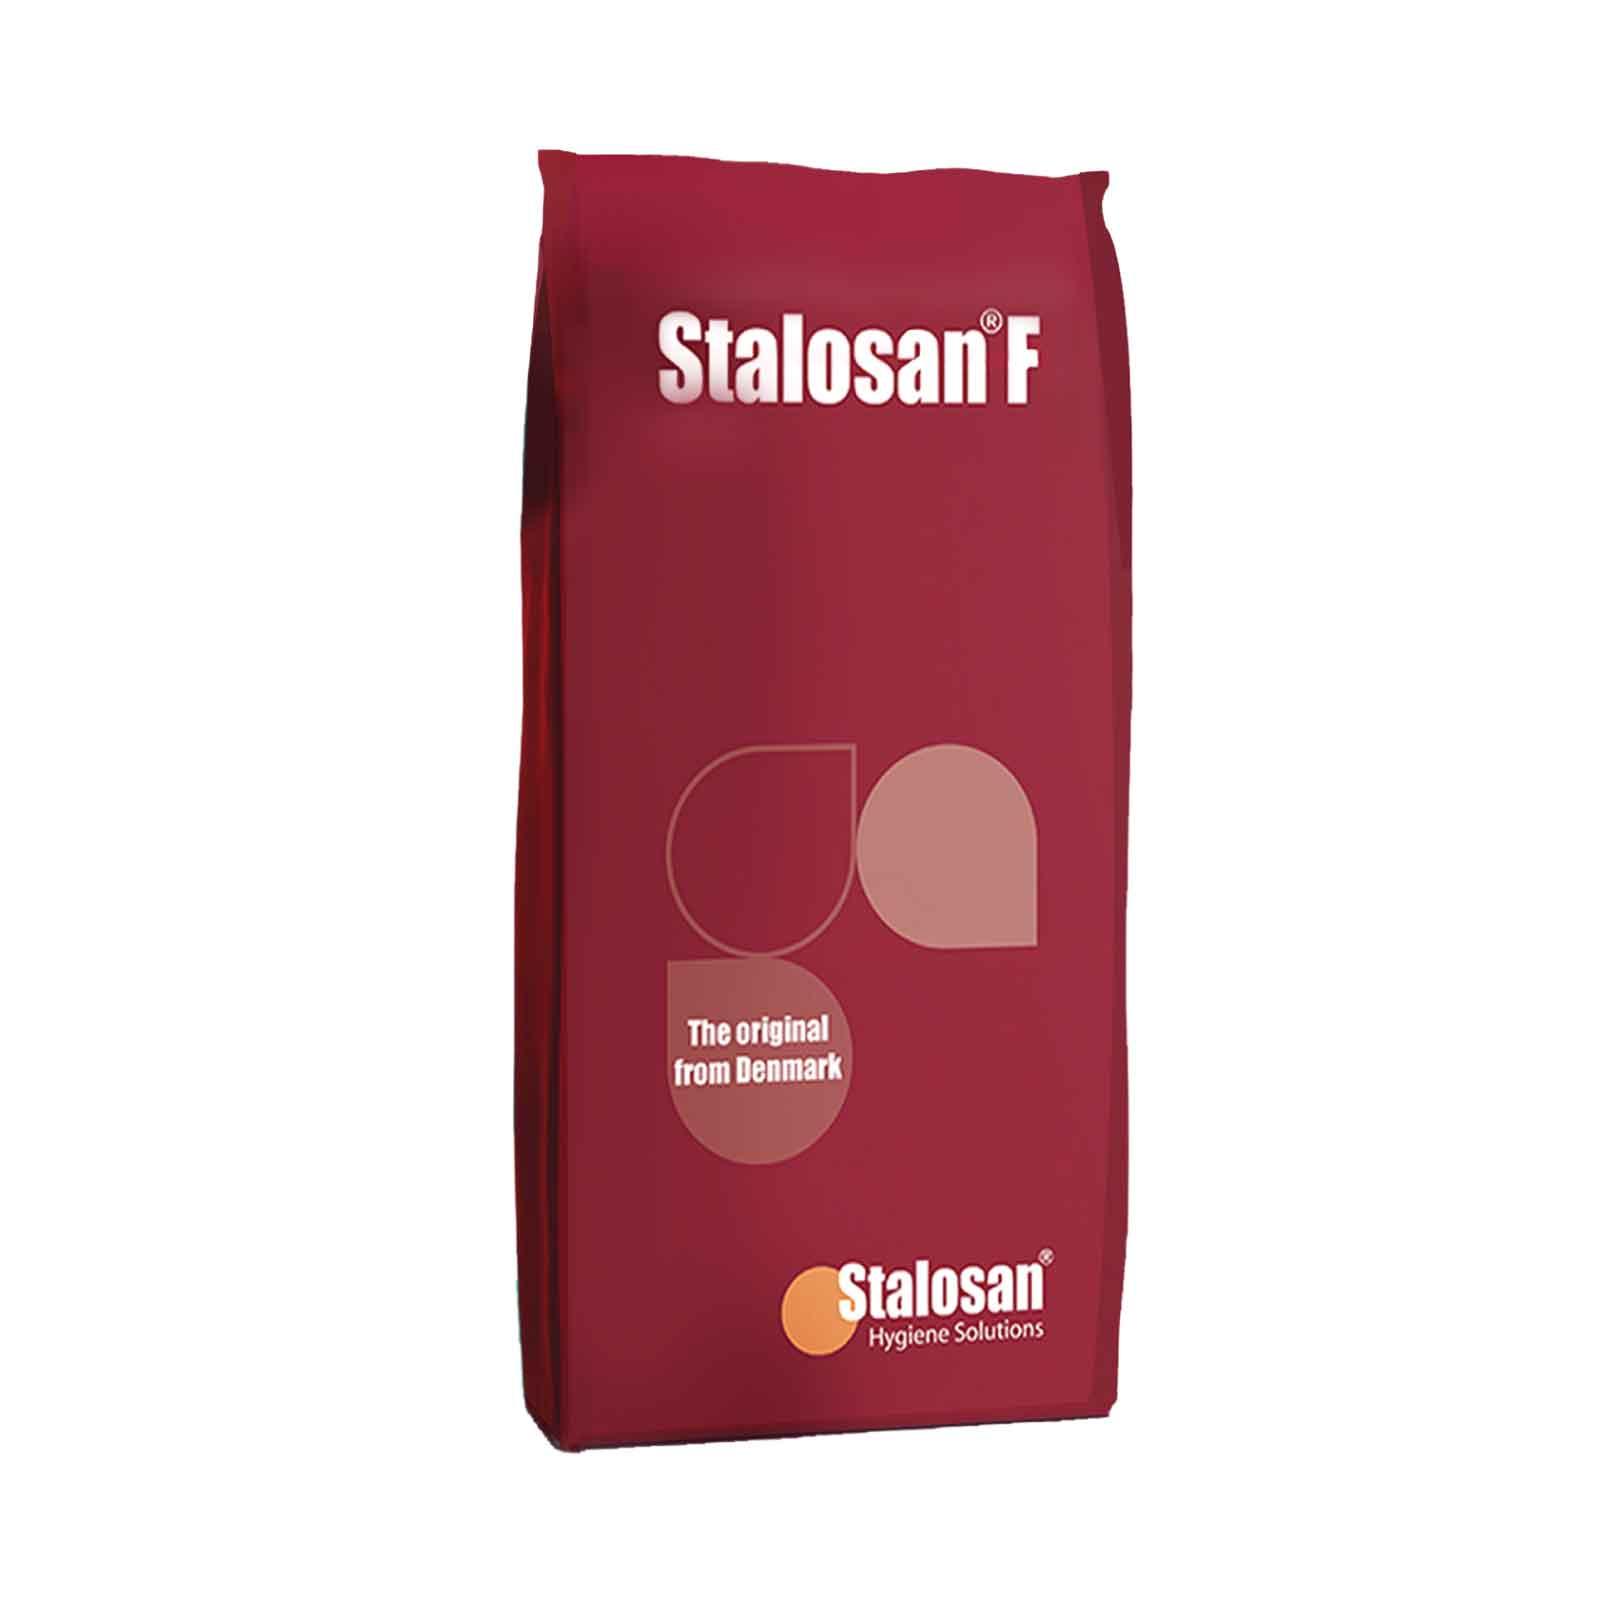 STALOSAN F